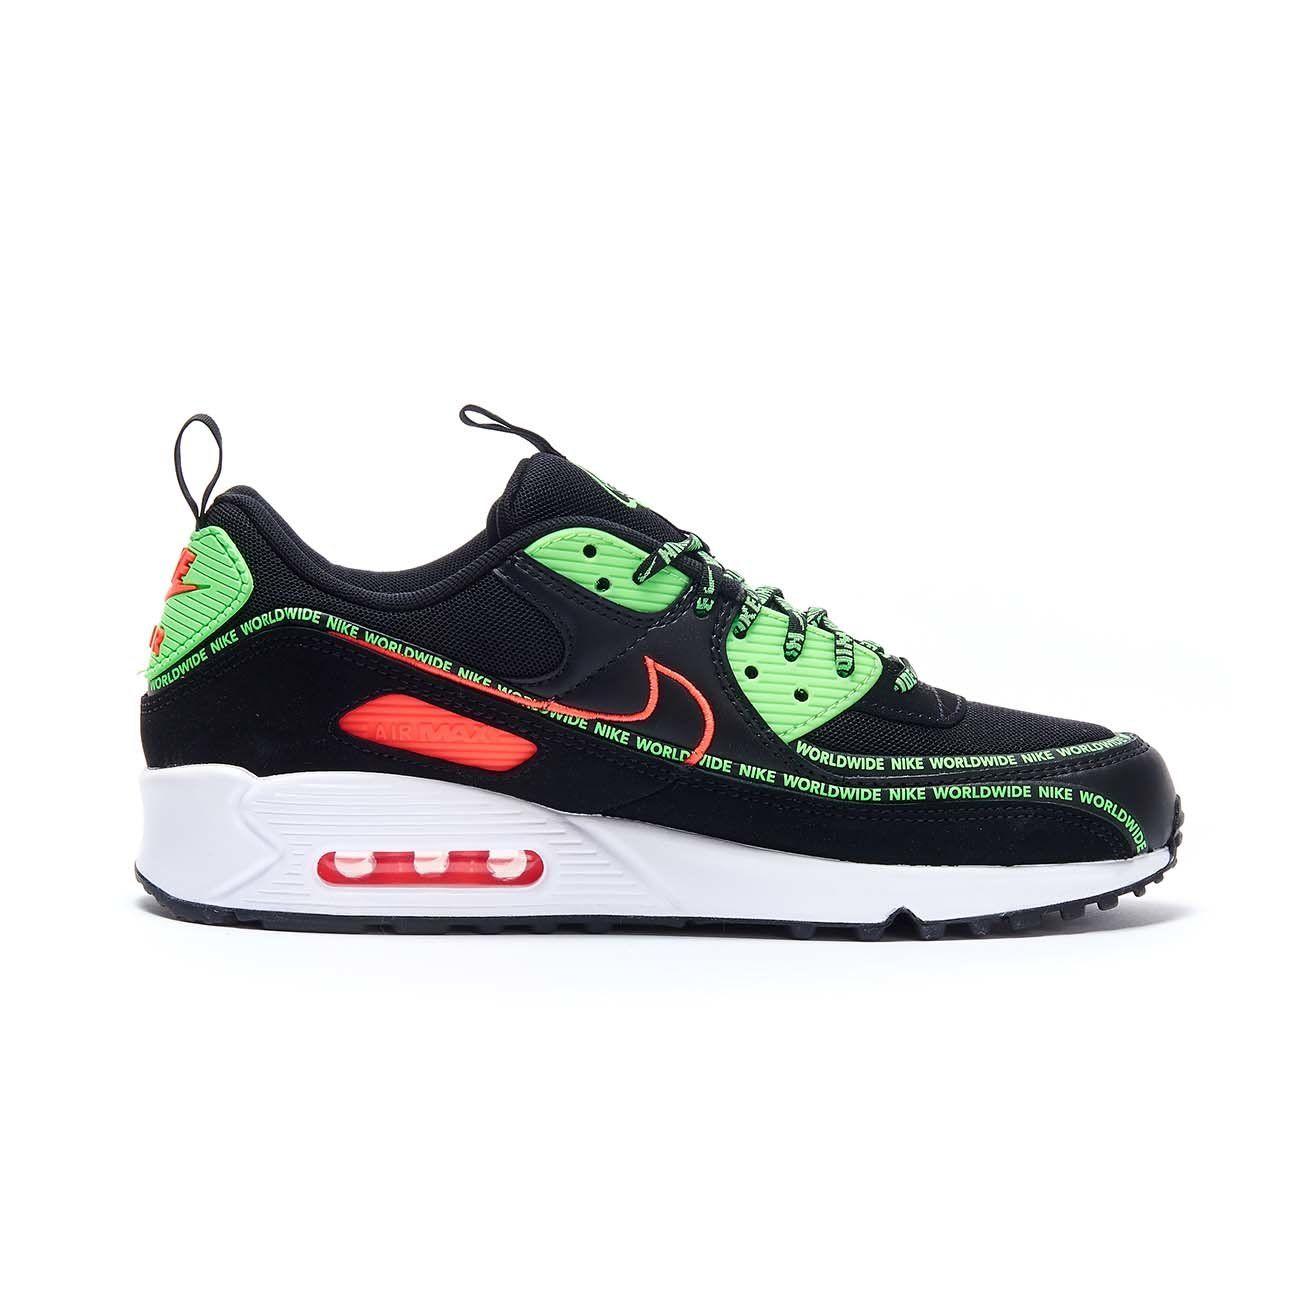 NIKE SNEAKERS AIR MAX 90 SE Uomo Black Green | Mascheroni Sportswear